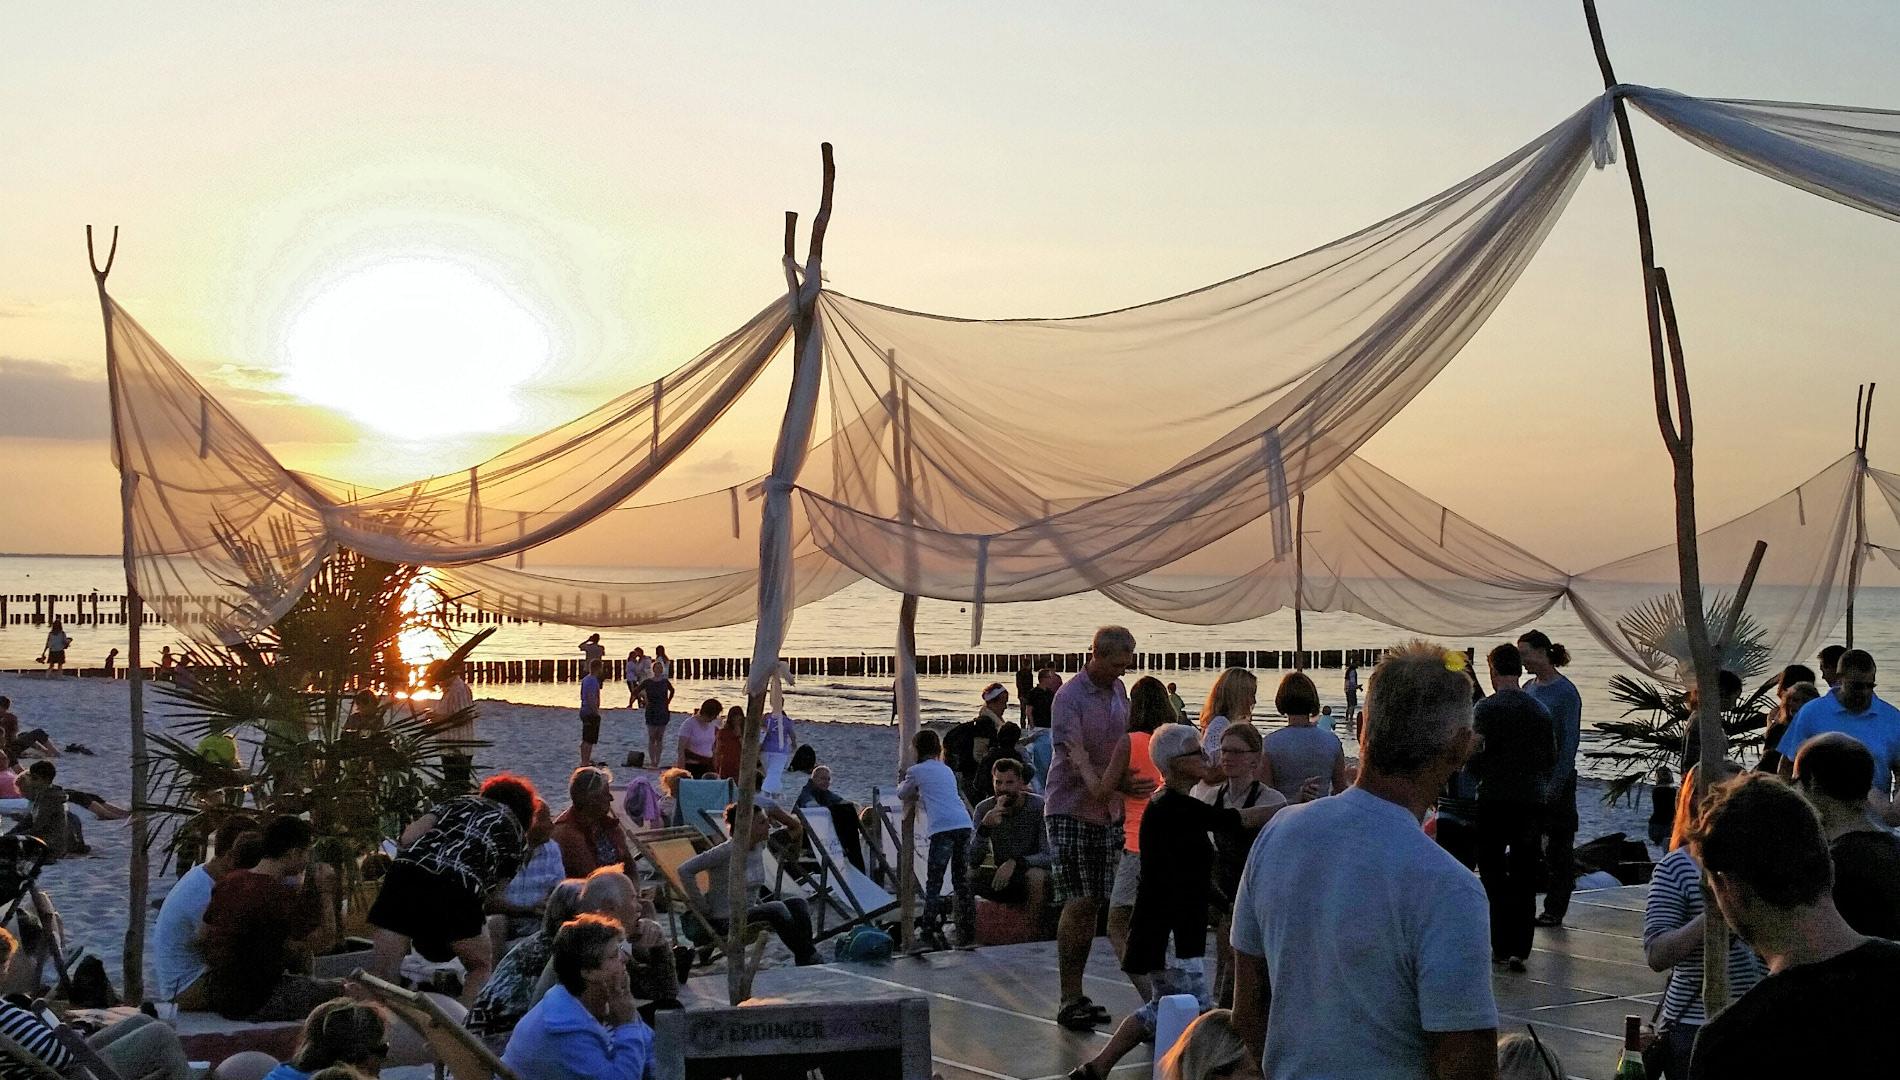 Markenentwicklung Corporate Design Zingst Strand Bar Sonnenuntergang Going Places